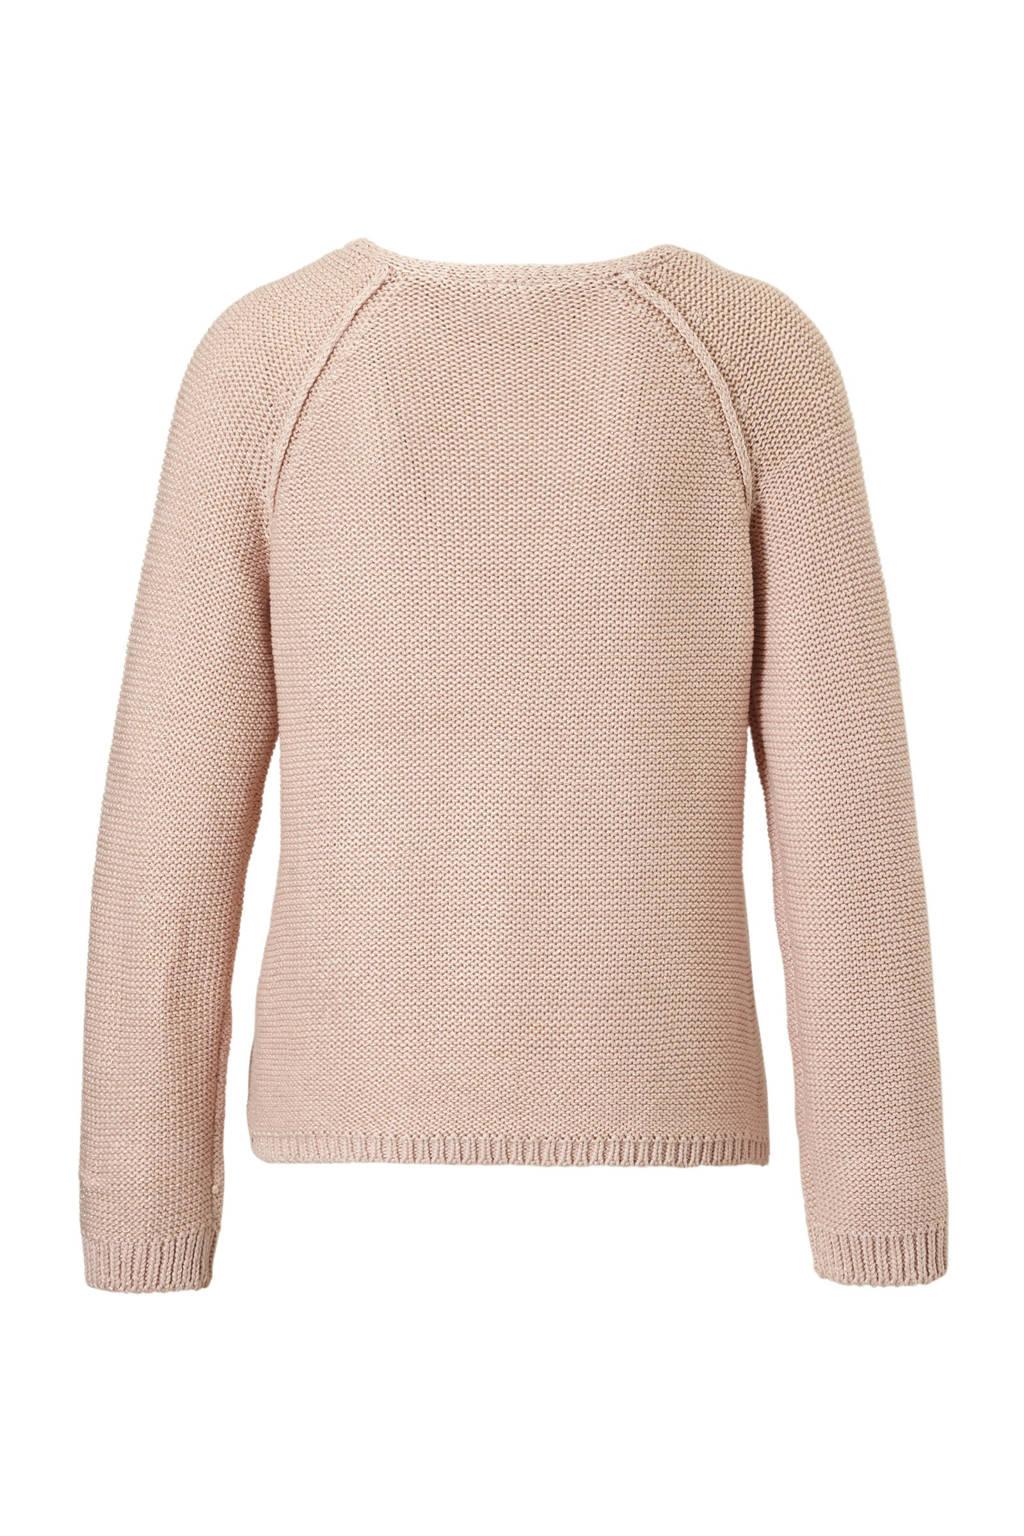 VILA gebreide trui met glitter details, roze/goud